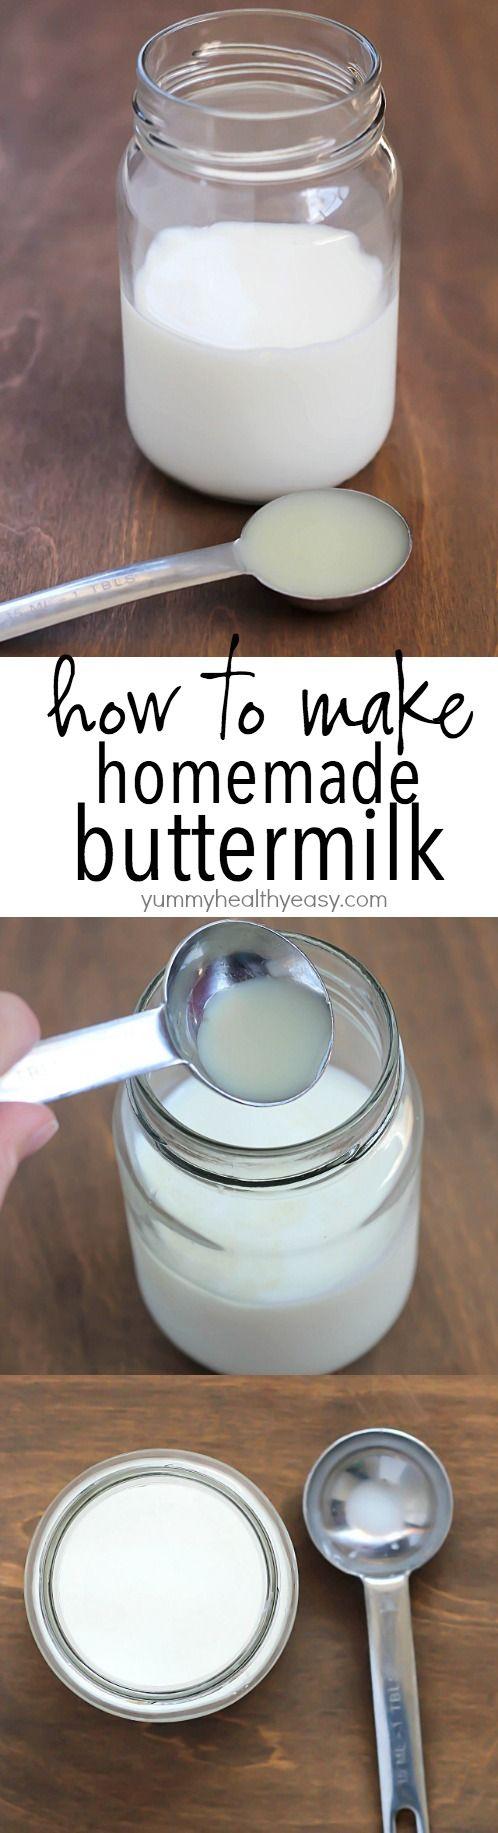 How to make Homemade Buttermilk (AKA / Sour Milk)